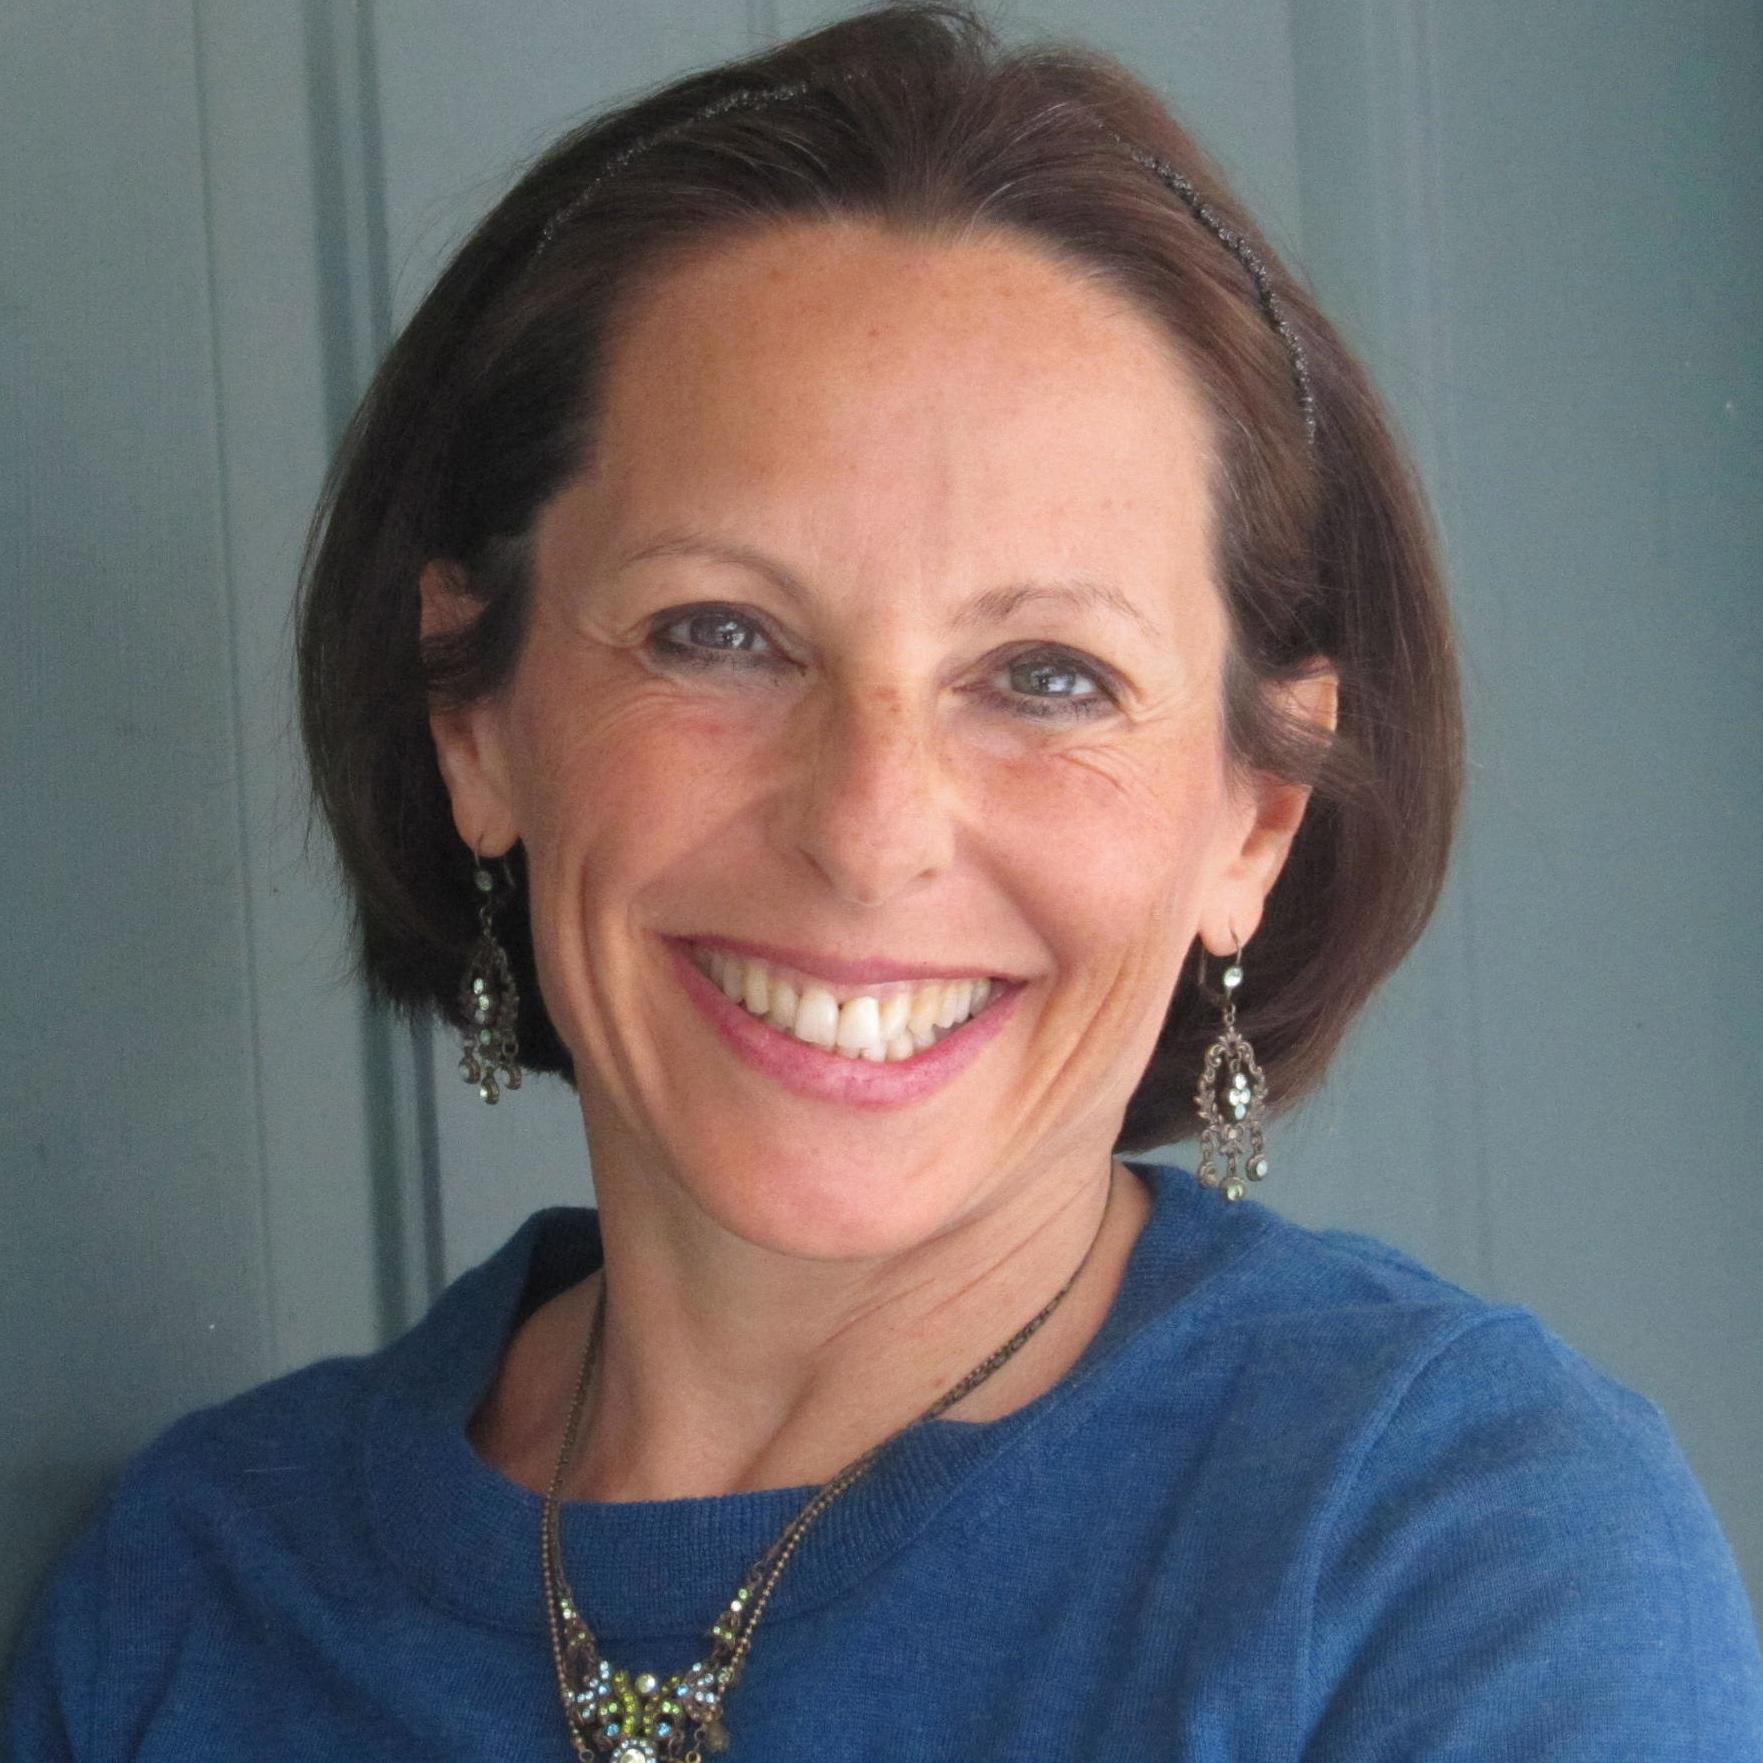 Anne Margolis Holistic Midwife